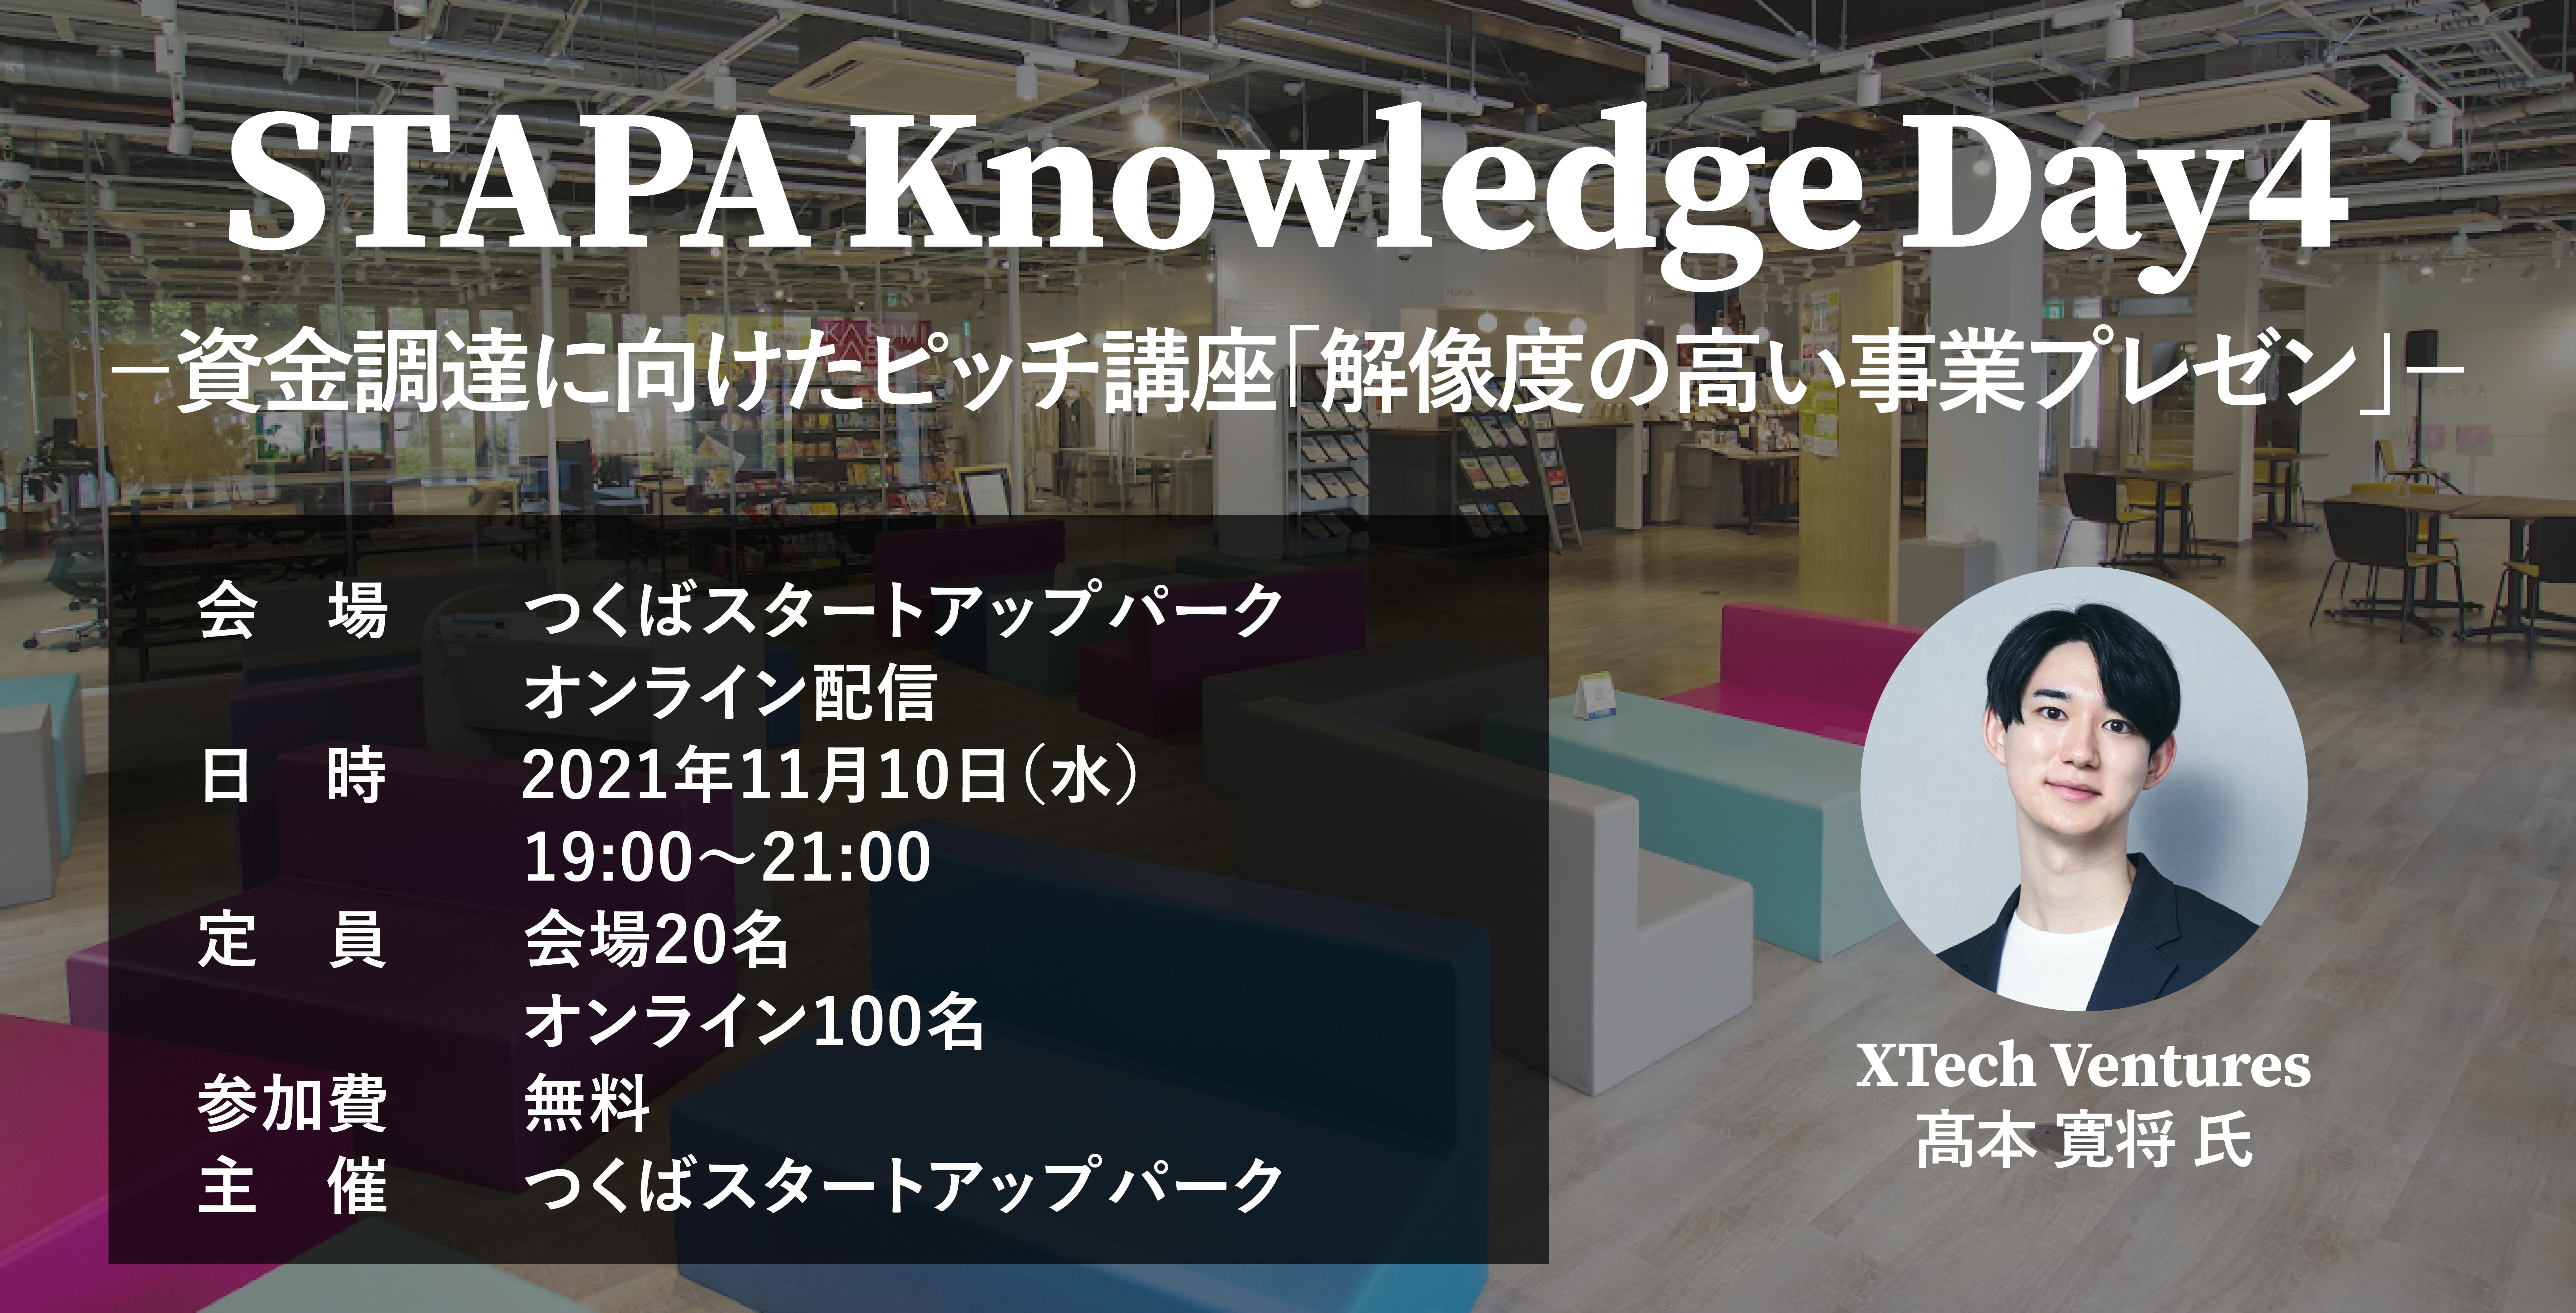 STAPA Knowledge Day4 -資金調達に向けたピッチ講座「解像度の高い事業プレゼン」-